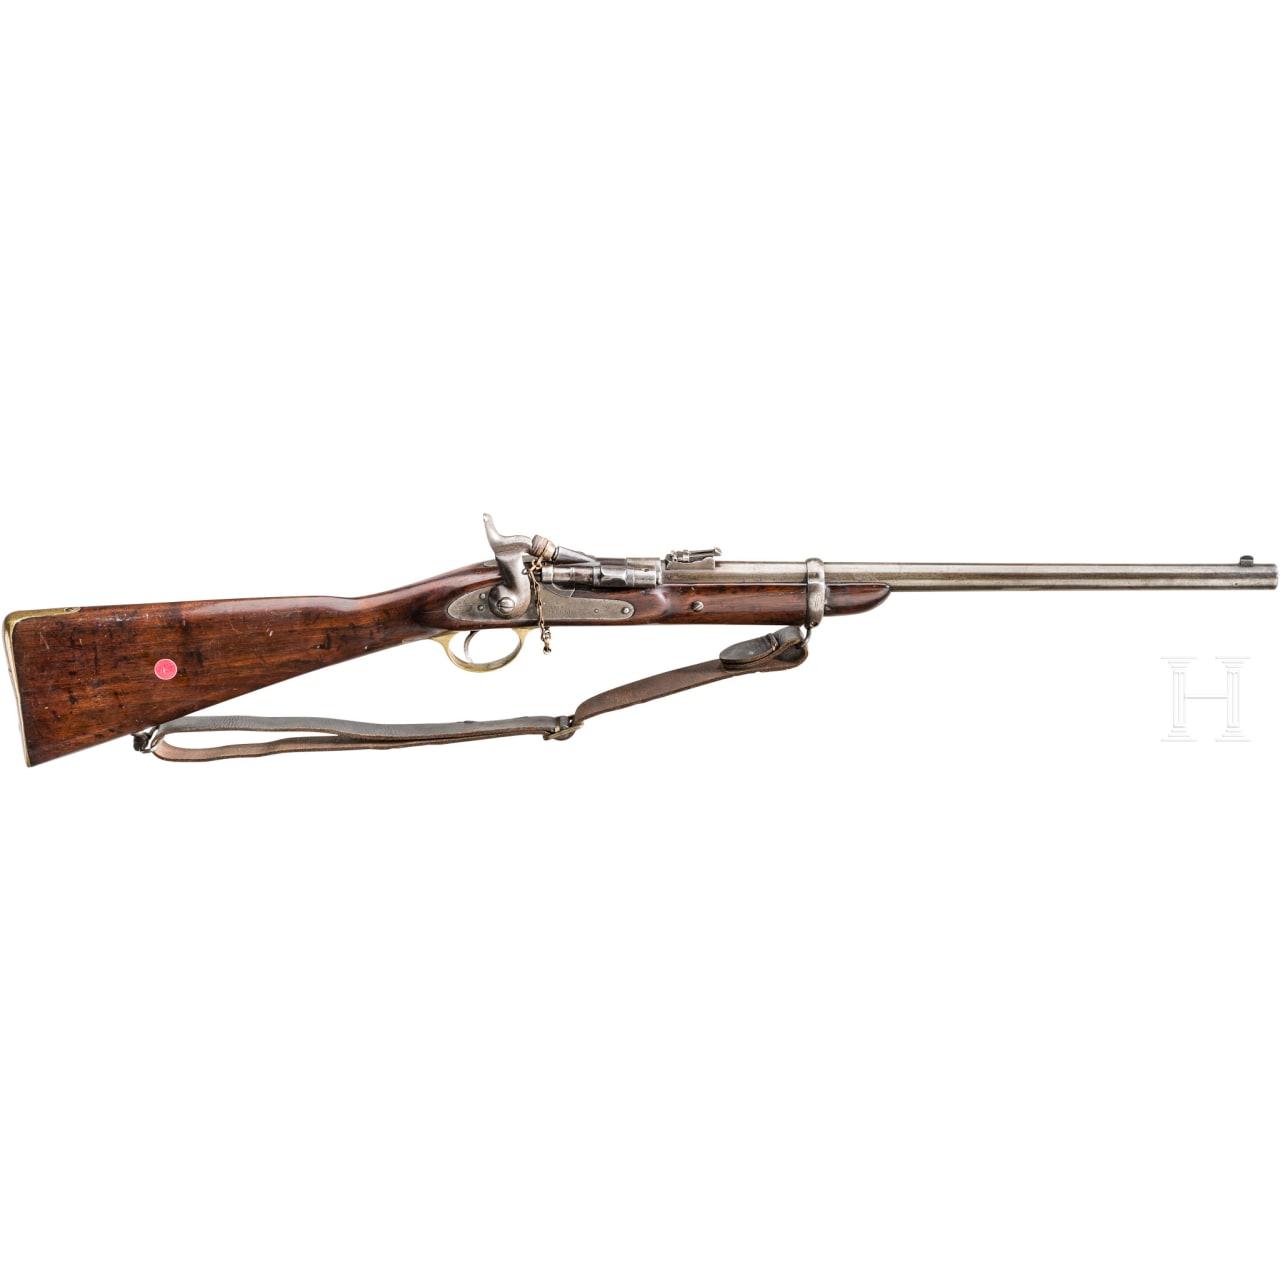 Snider Carbine